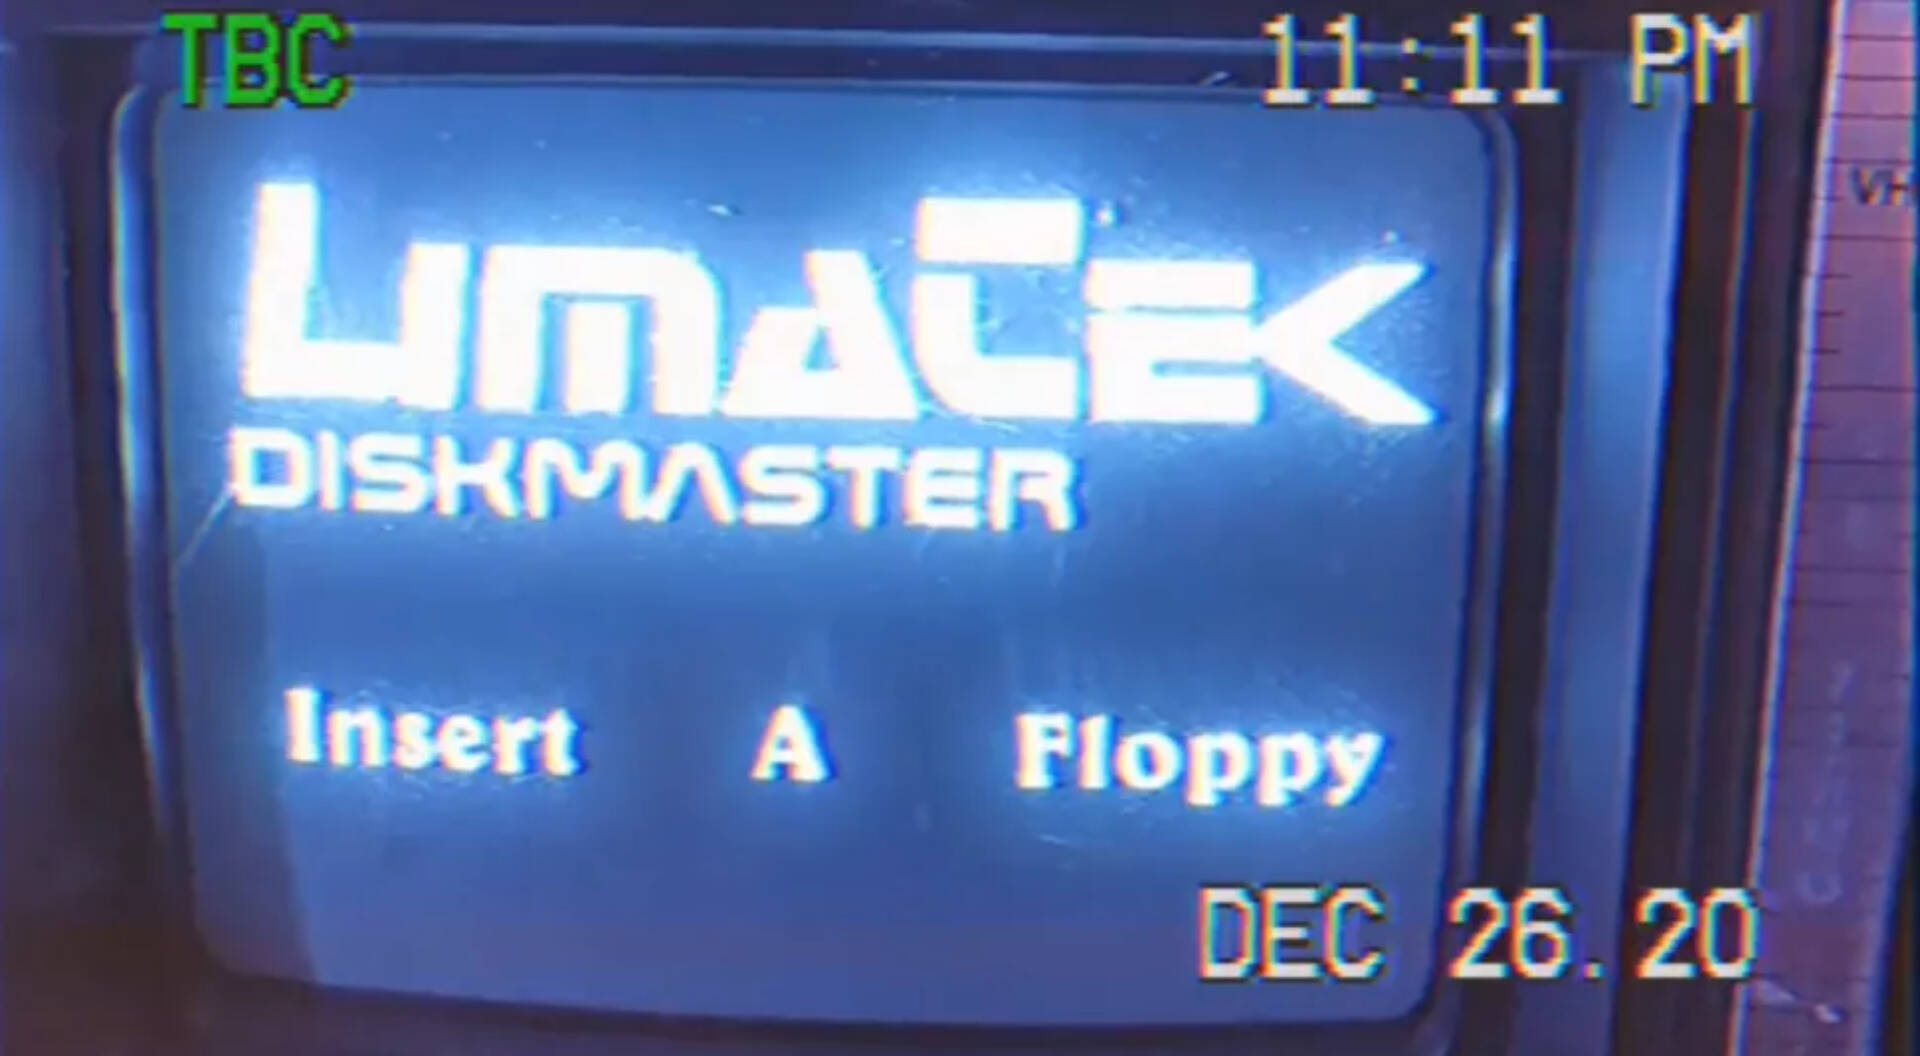 Raspberry Pi LimaTek Diskmaster